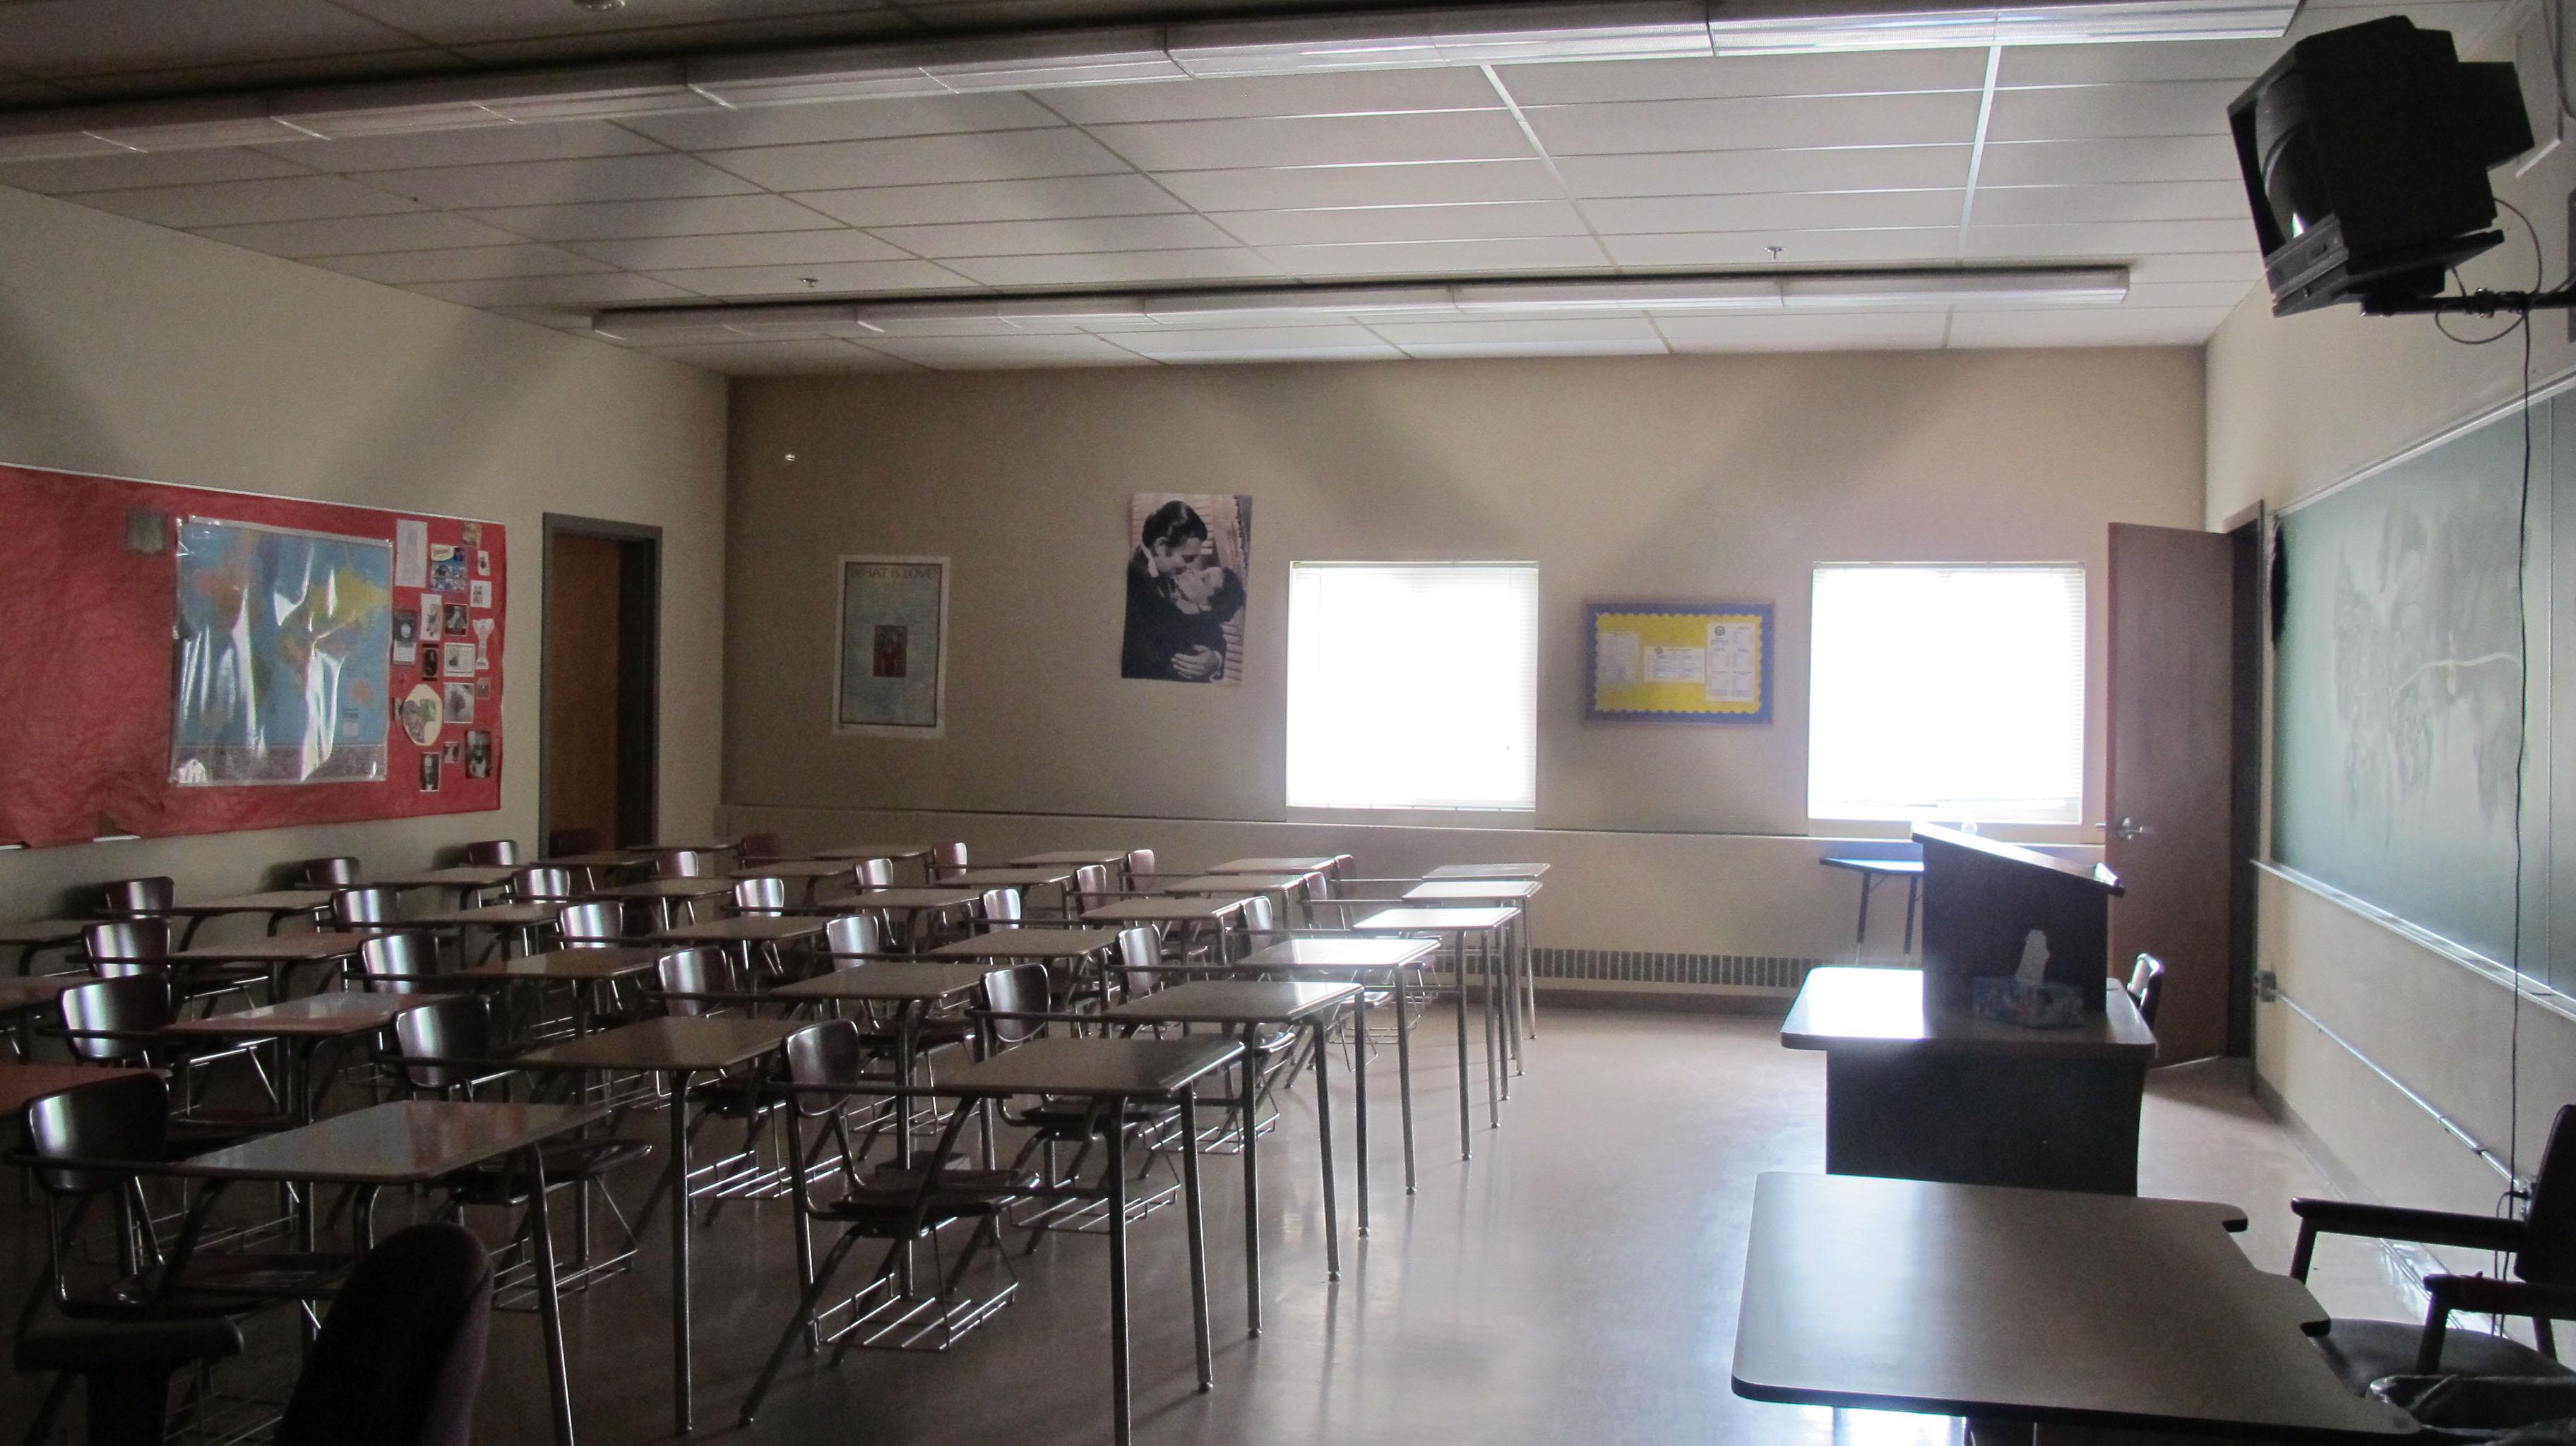 jillian corey�s old classroom stateimpact new hampshire